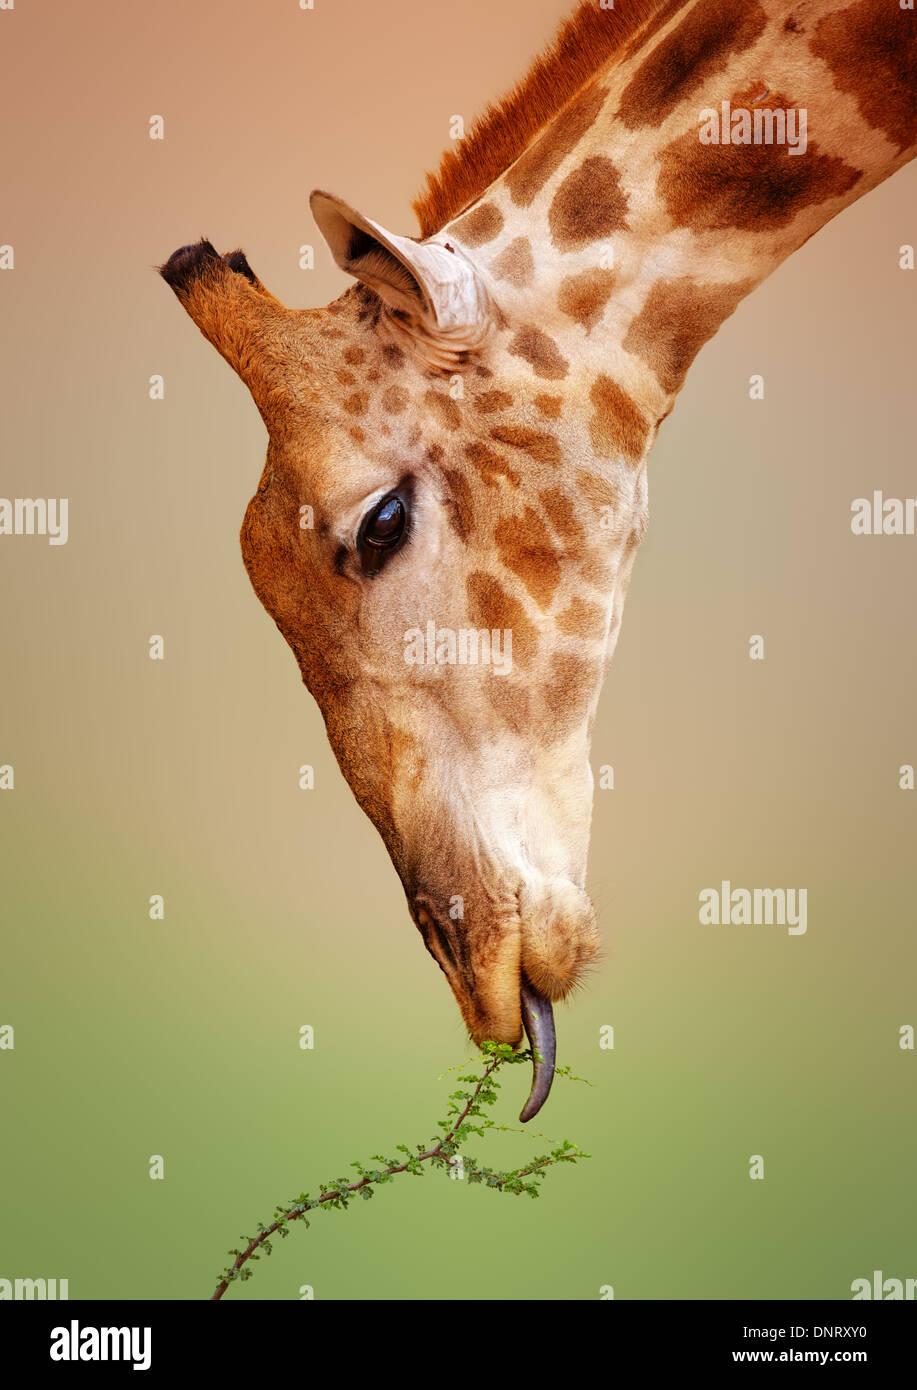 Close-up di una giraffa di mangiare un thorn bush - Kgalagadi Parco transfrontaliera (Sud Africa) Immagini Stock